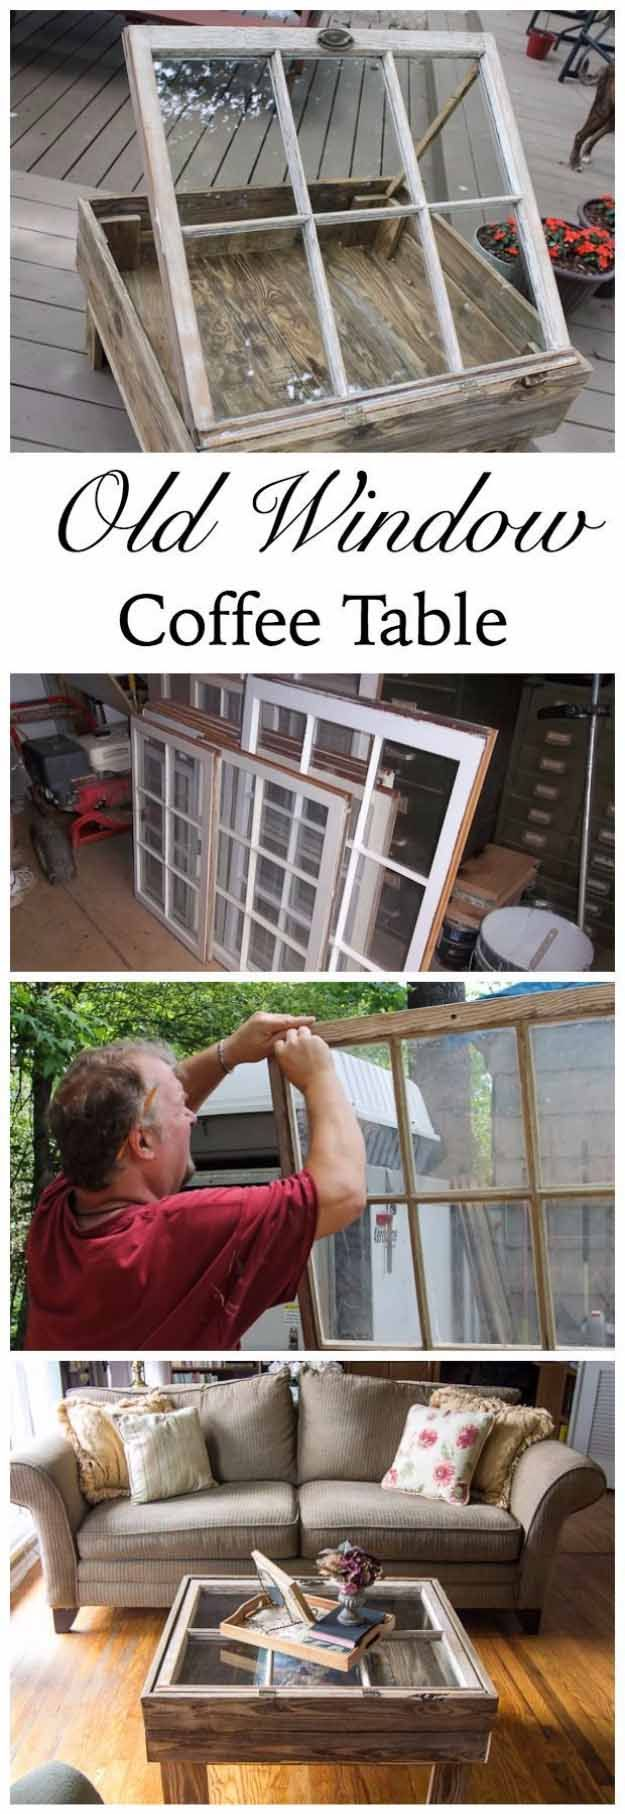 16 DIY Ideas for Coffee Tables 4